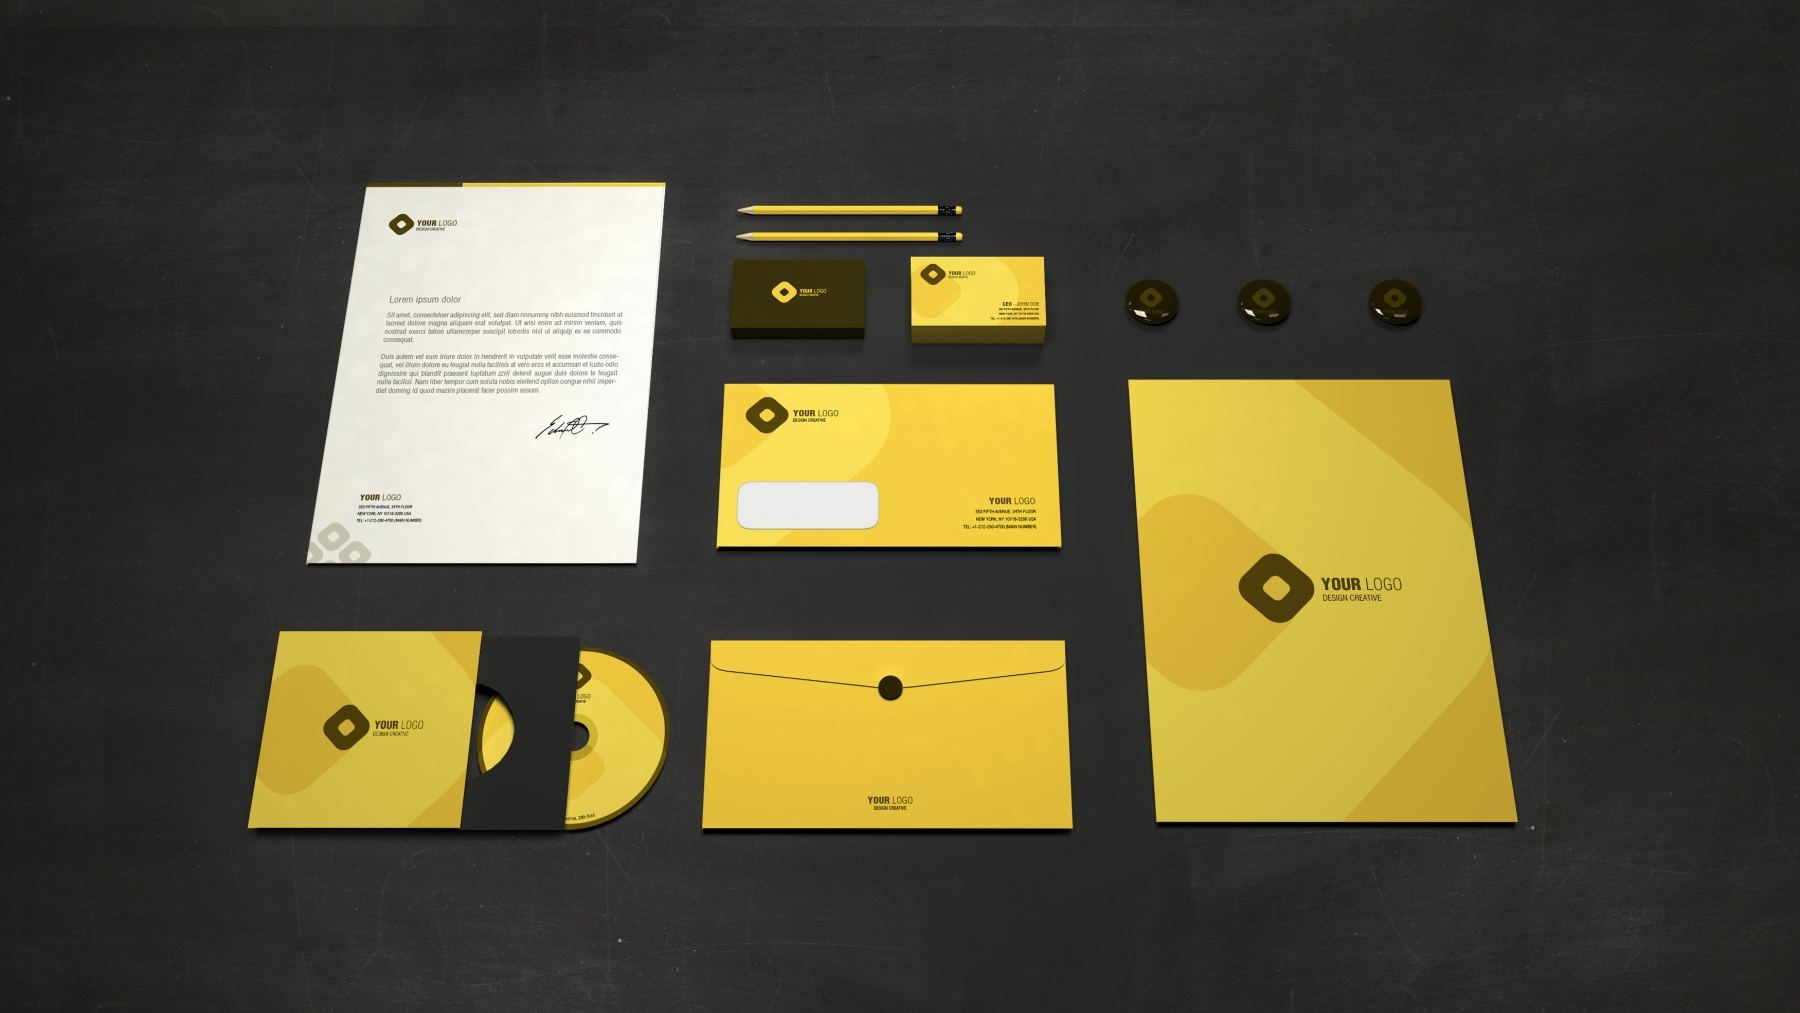 1569733362 2a0139e75384d9d - 黄色系简约纯色办公企业vi样机